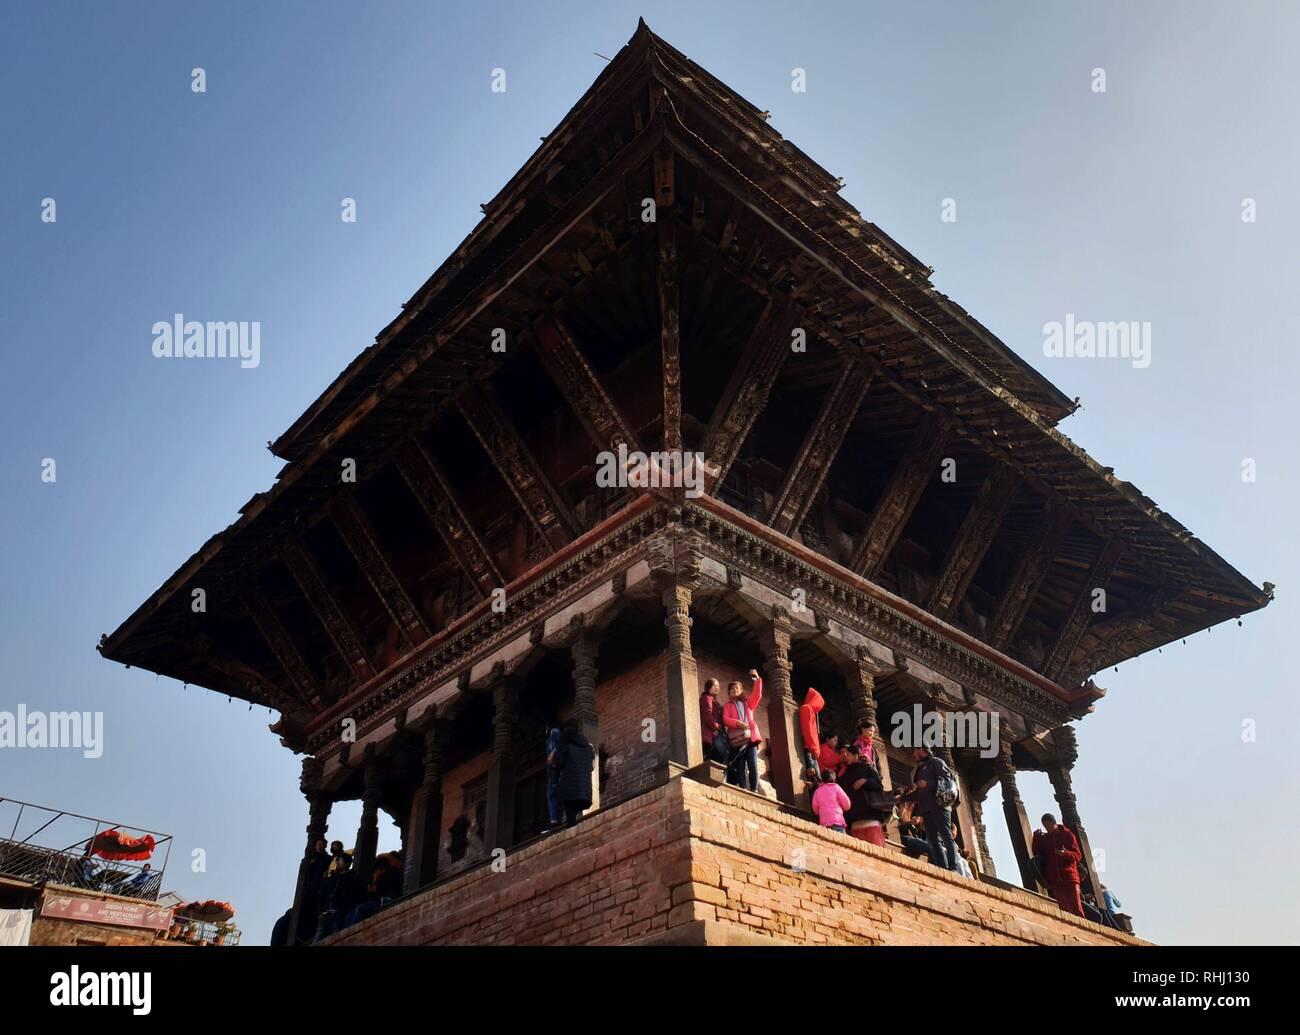 Beijing, Nepal. 2nd Feb, 2019. People visit the Nyatapole temple in Bhaktapur, Nepal, Feb. 2, 2019. Credit: Sunil Sharma/Xinhua/Alamy Live News - Stock Image